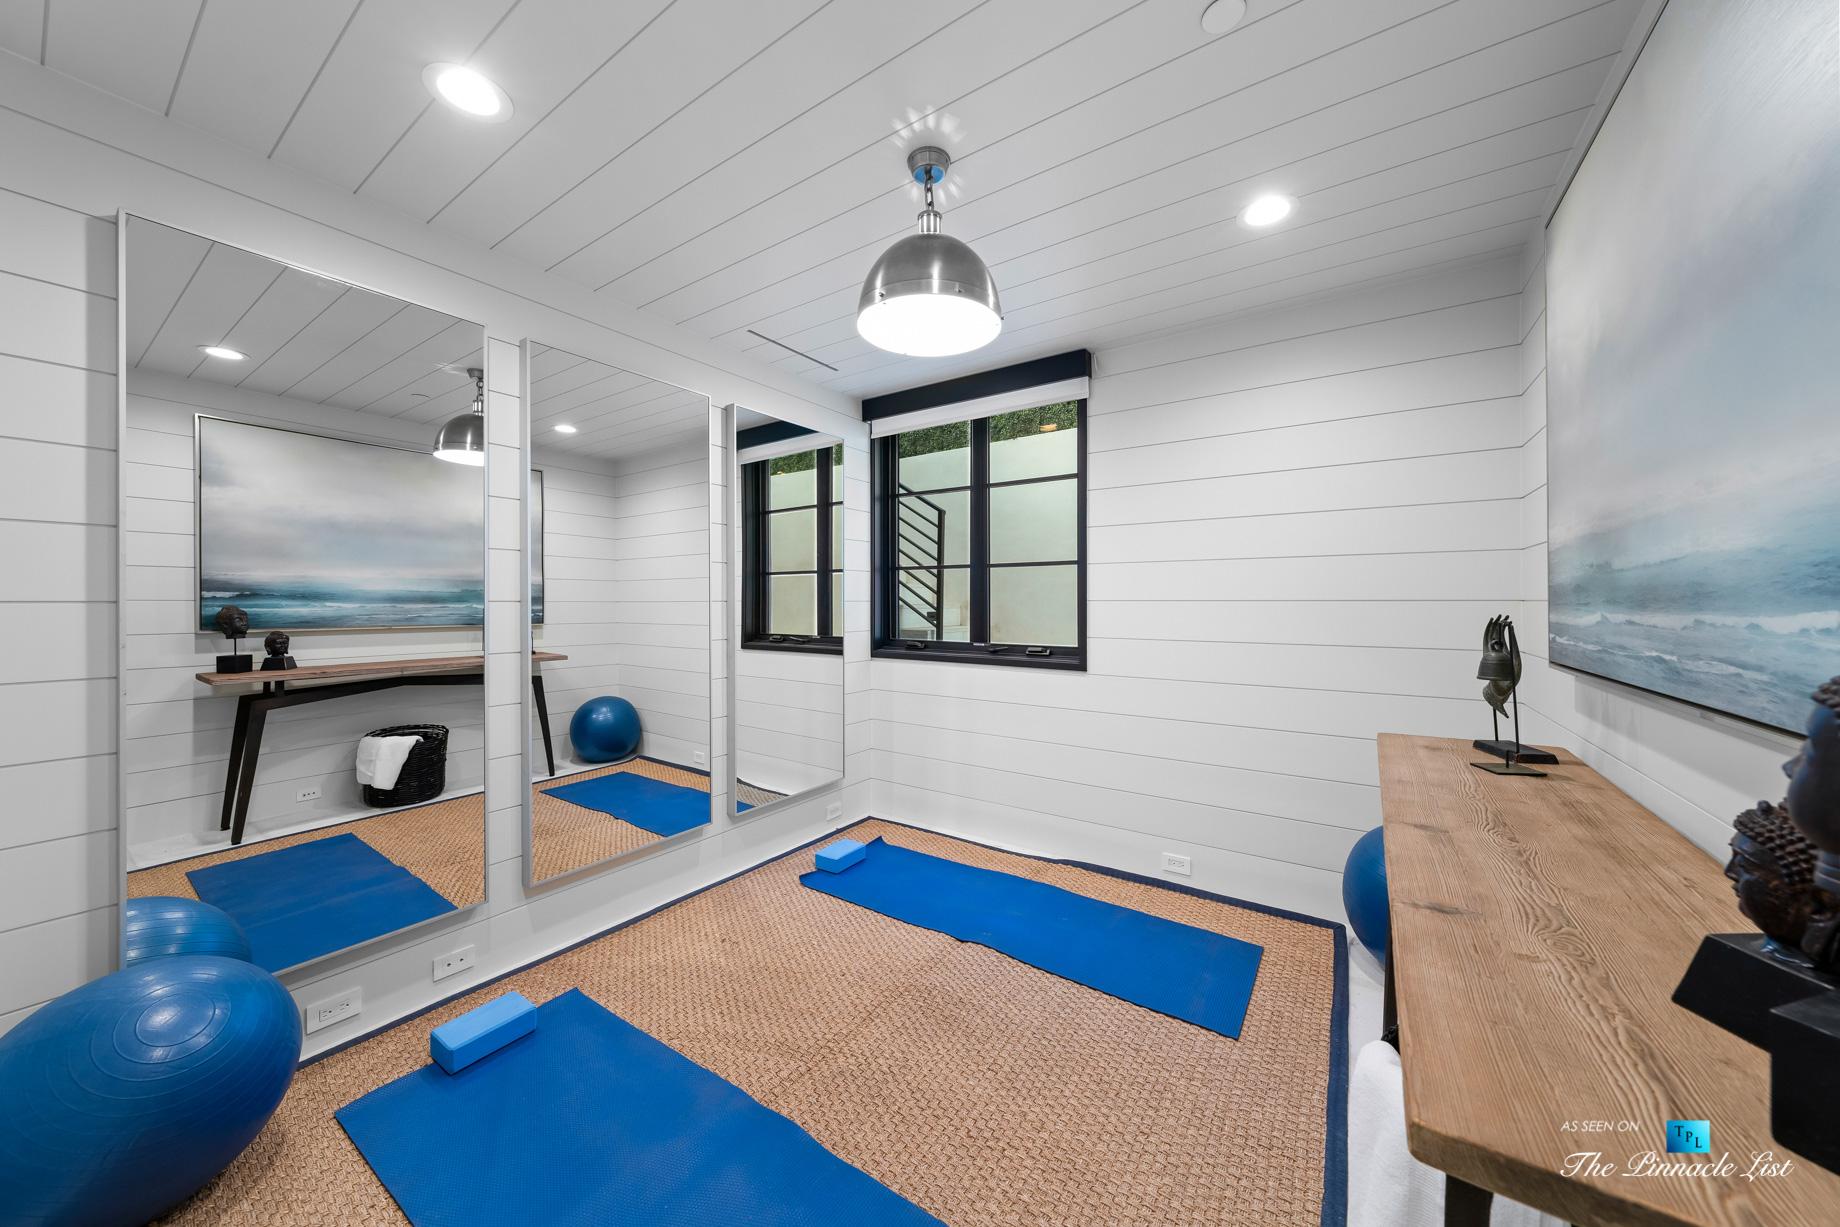 508 The Strand, Manhattan Beach, CA, USA – Lower Level Yoga Room – Luxury Real Estate – Oceanfront Home